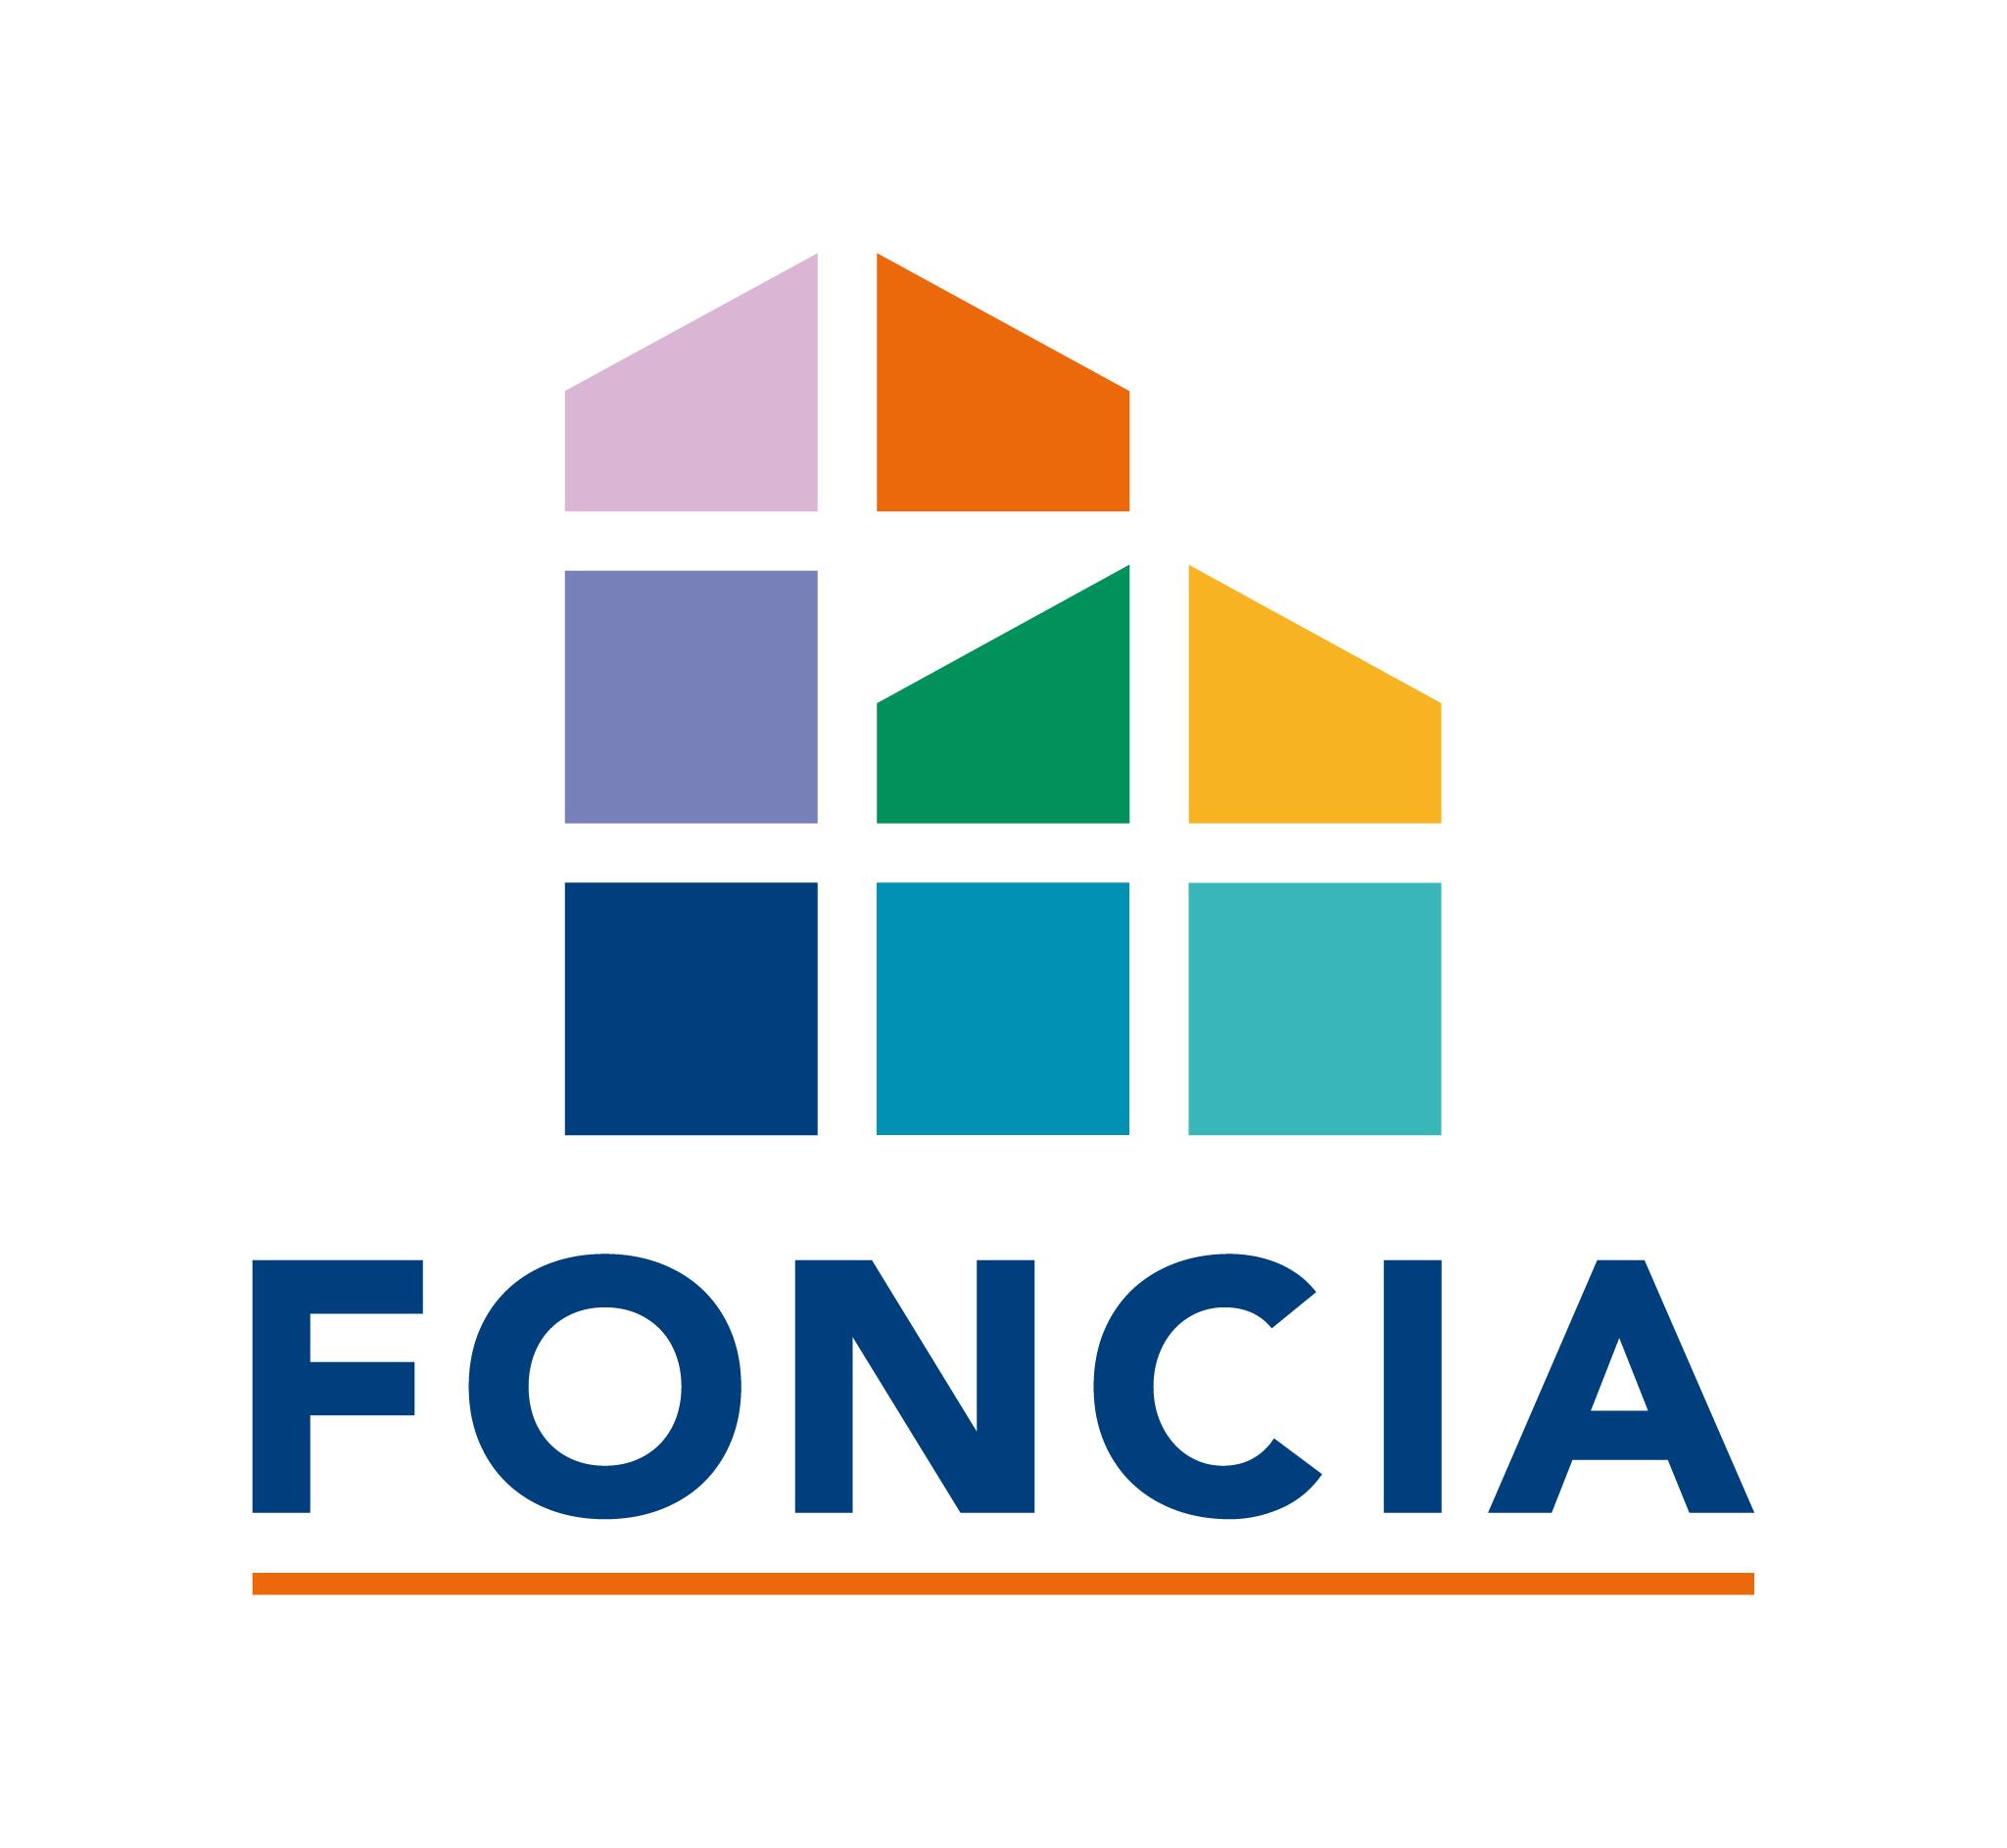 FONCIA_LOGO_V_RVB_ligne-01